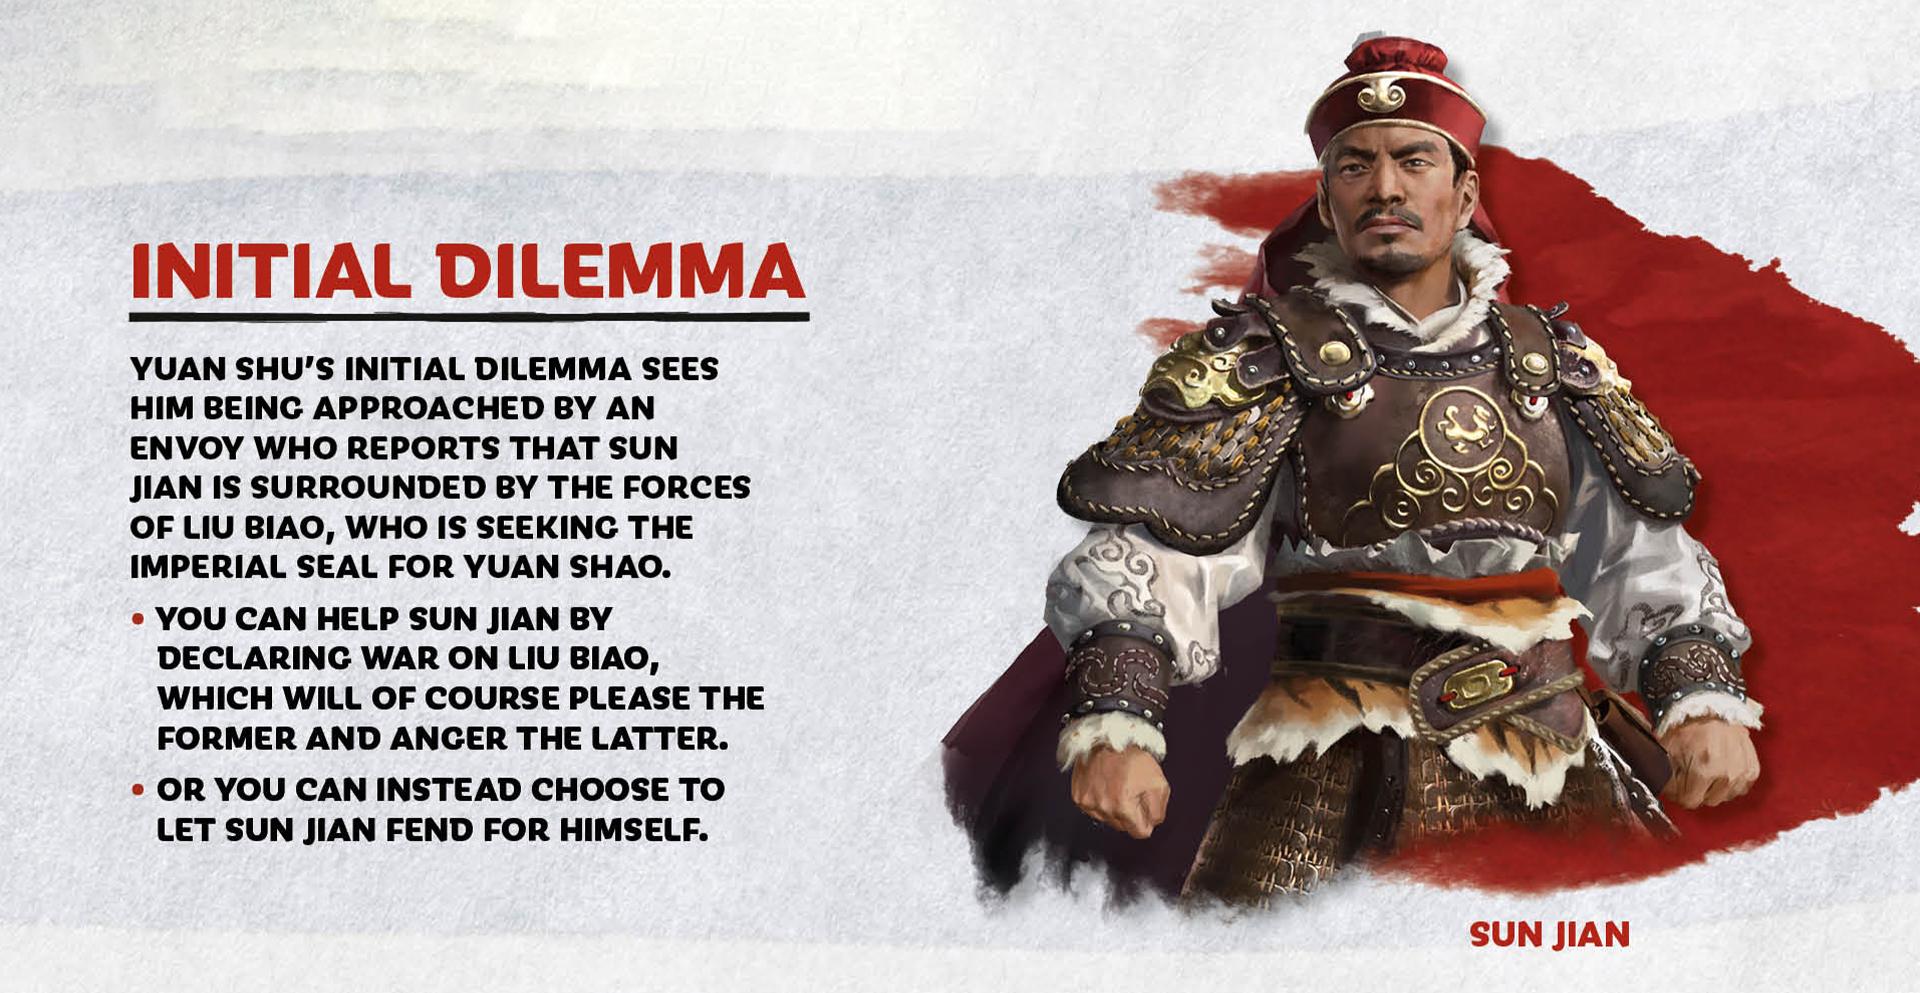 Inital-dilemma3.png